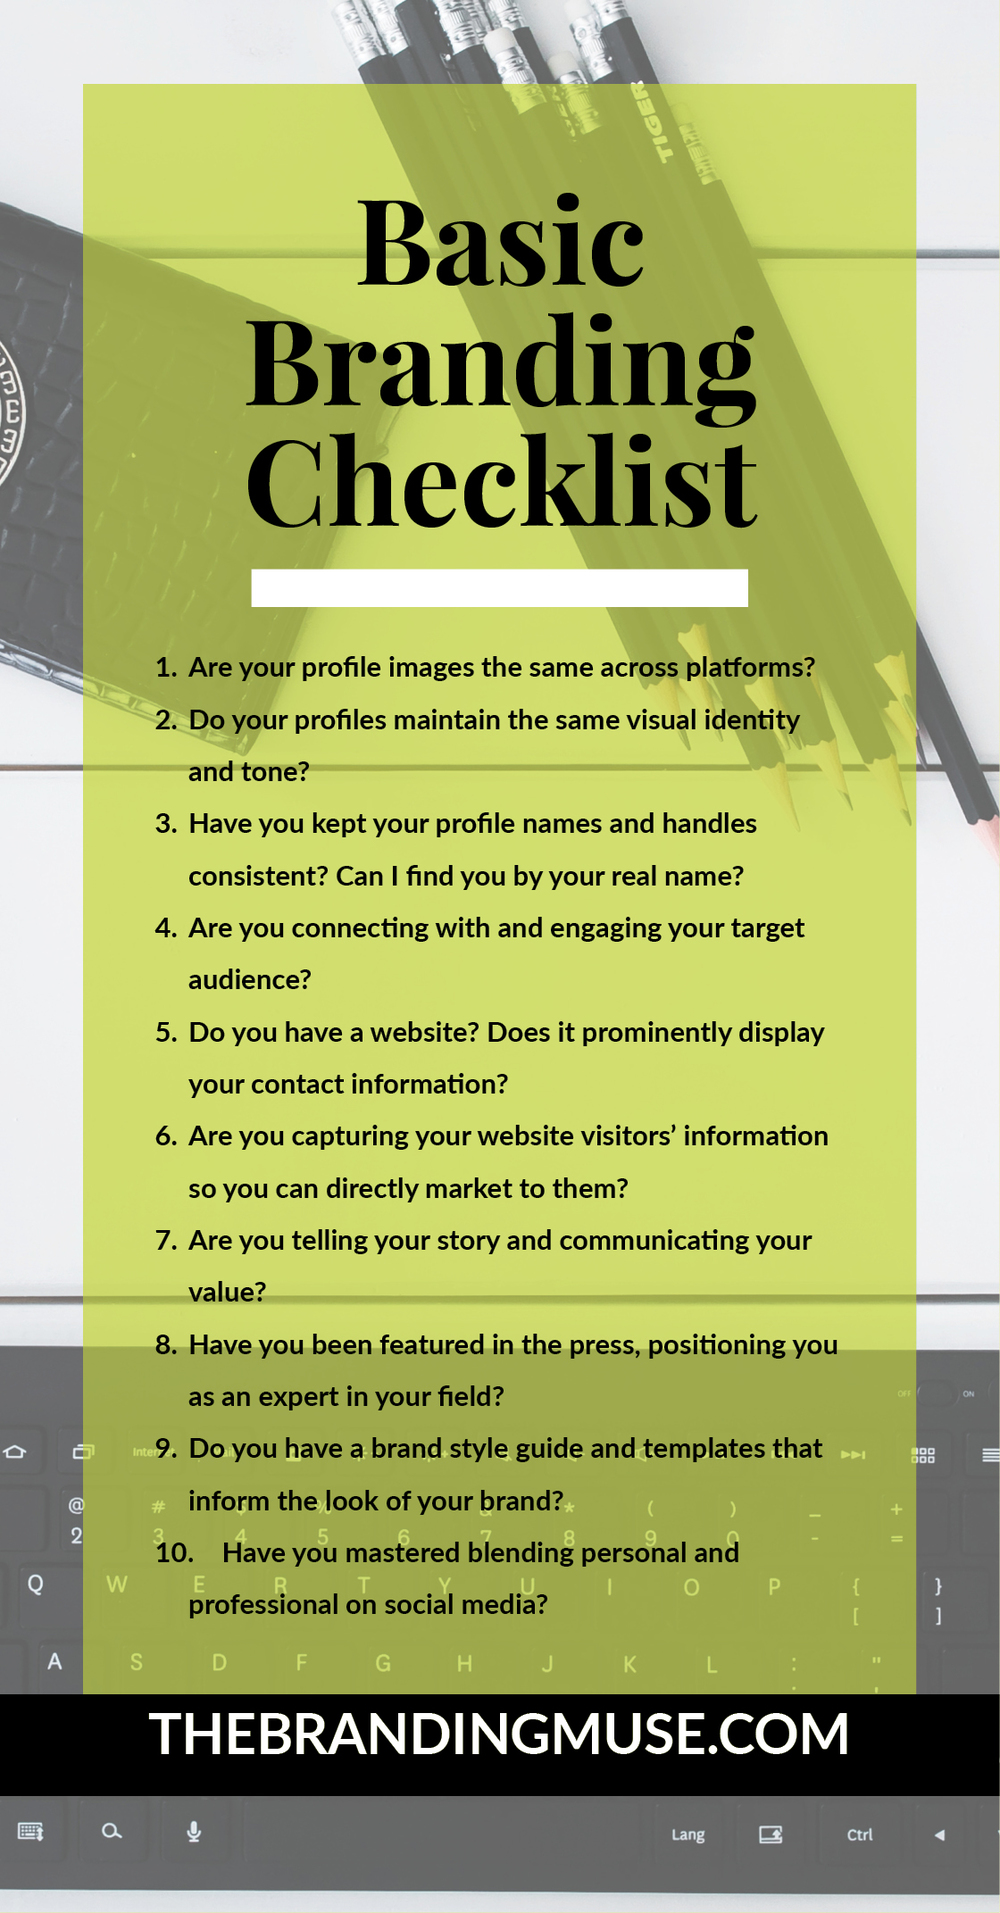 Basic Personal Branding Checklist